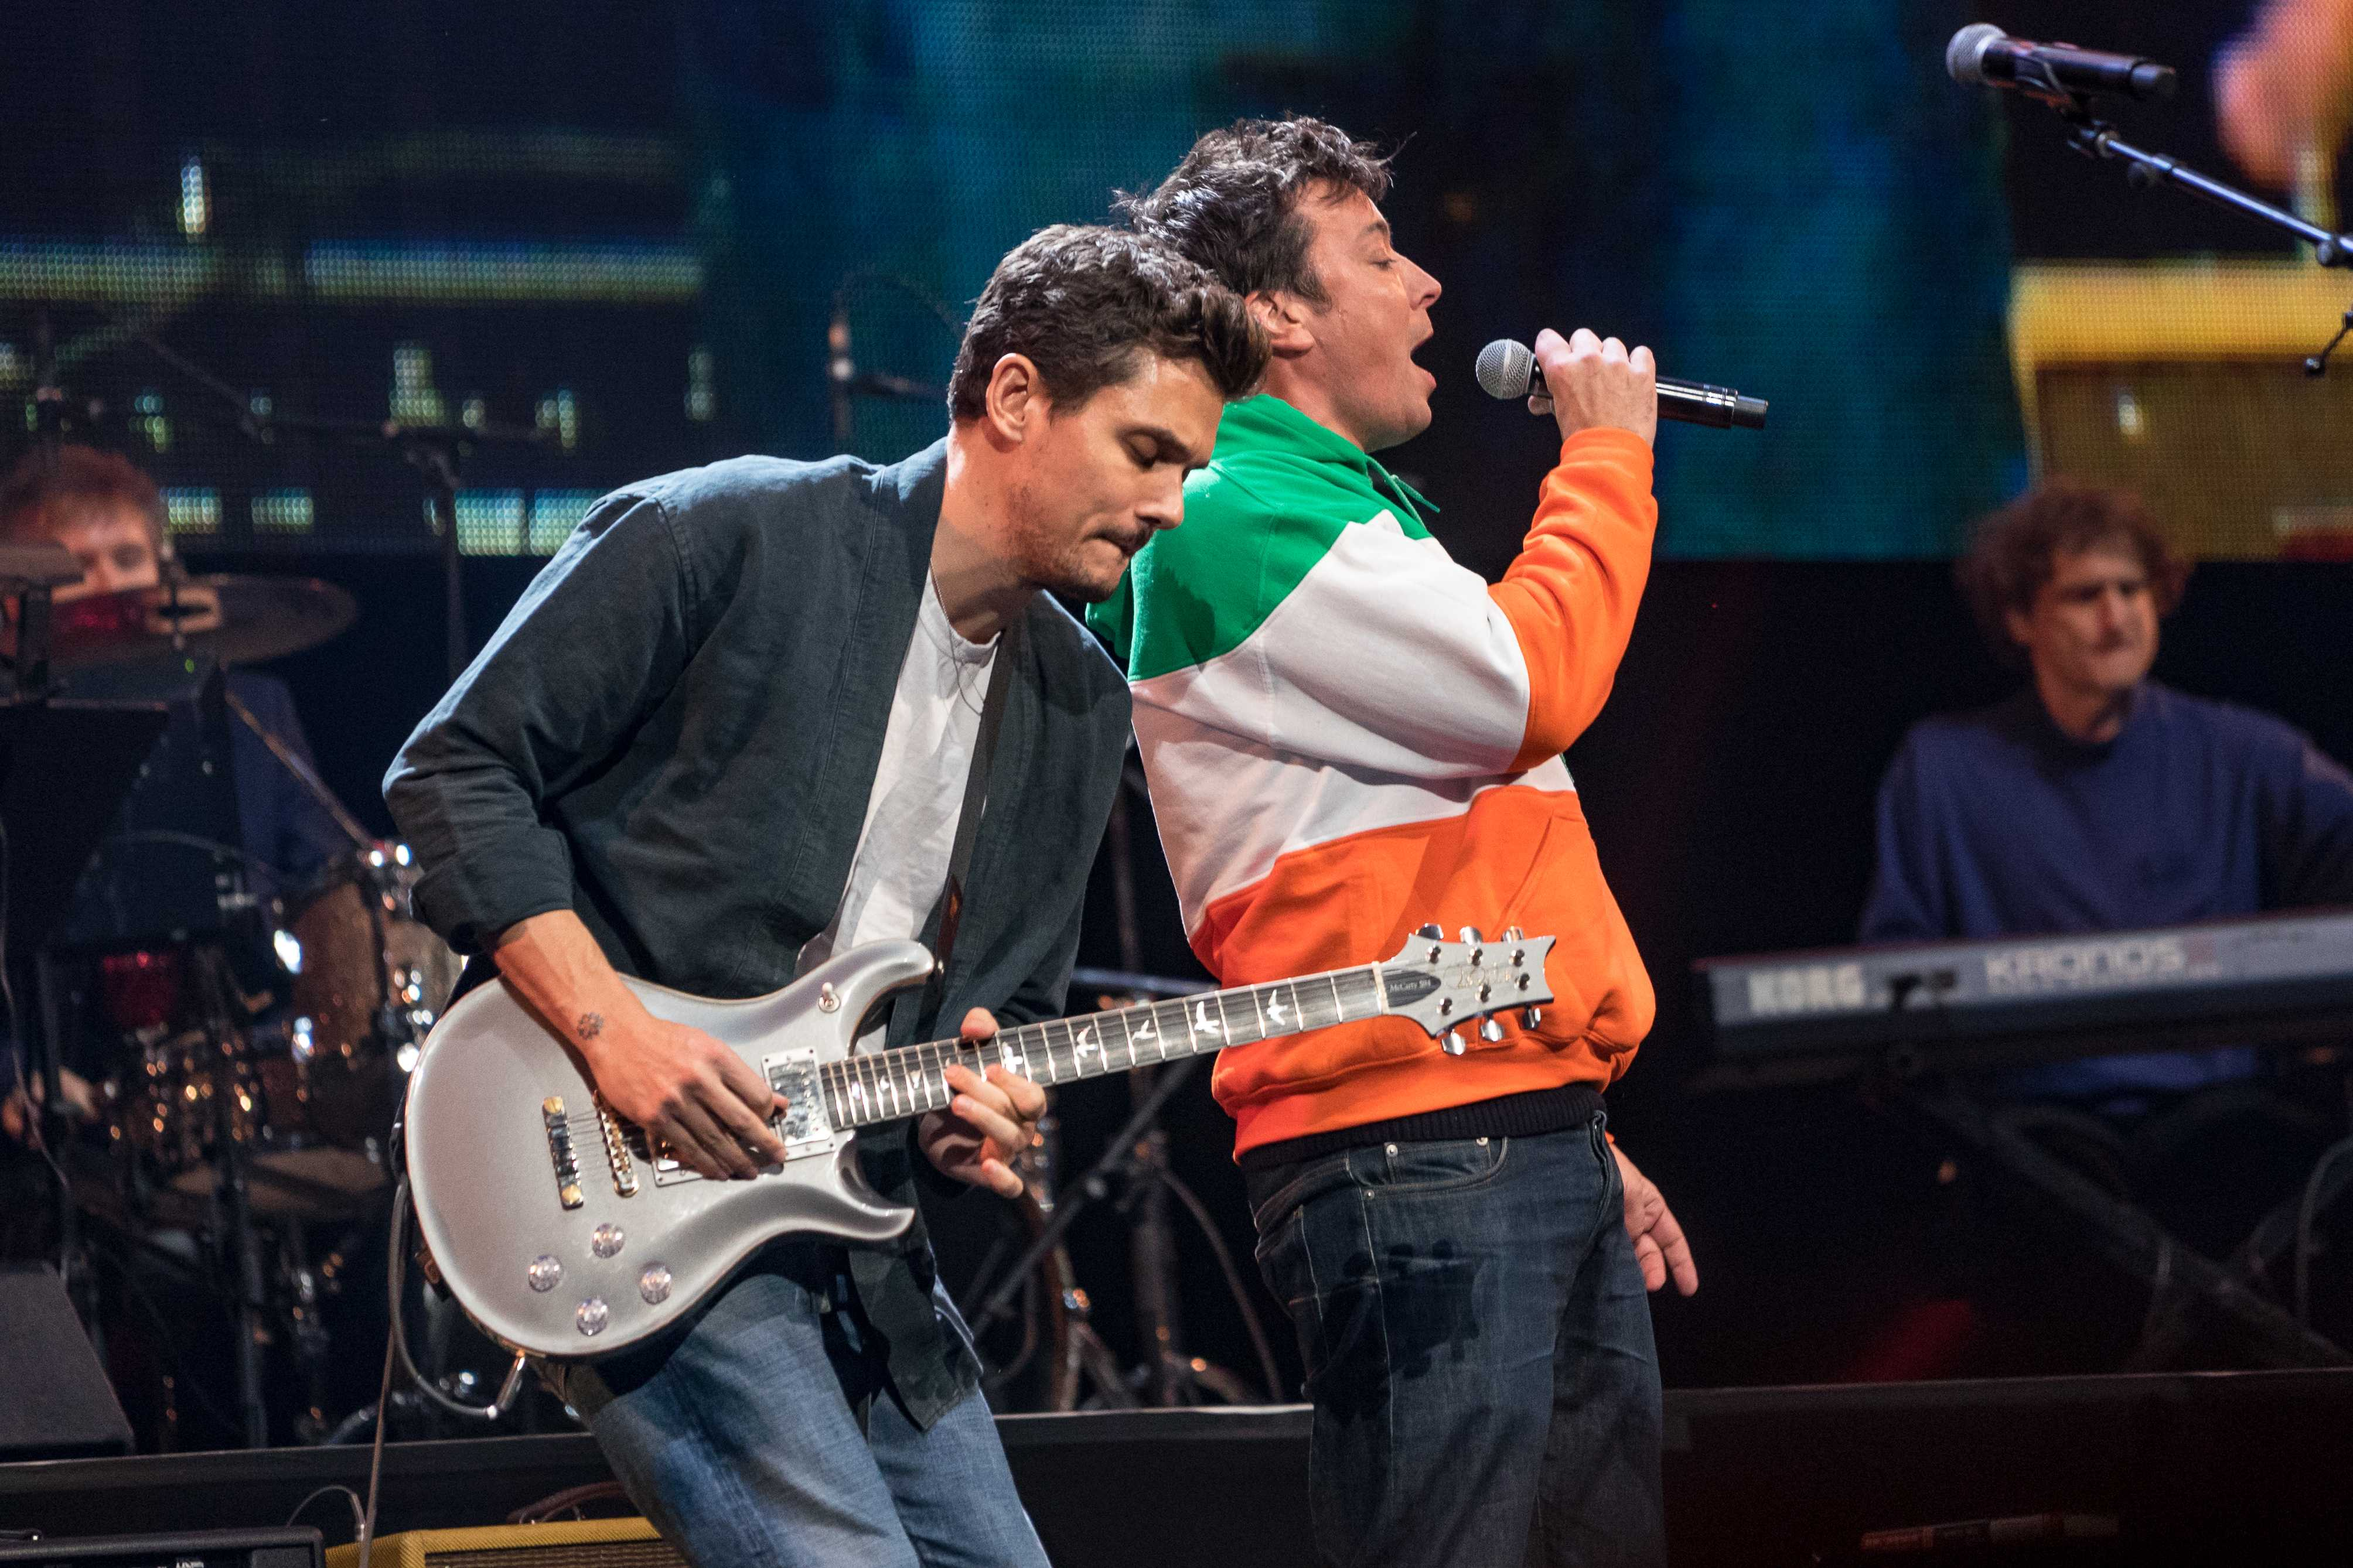 John Mayer and Jimmy Fallon